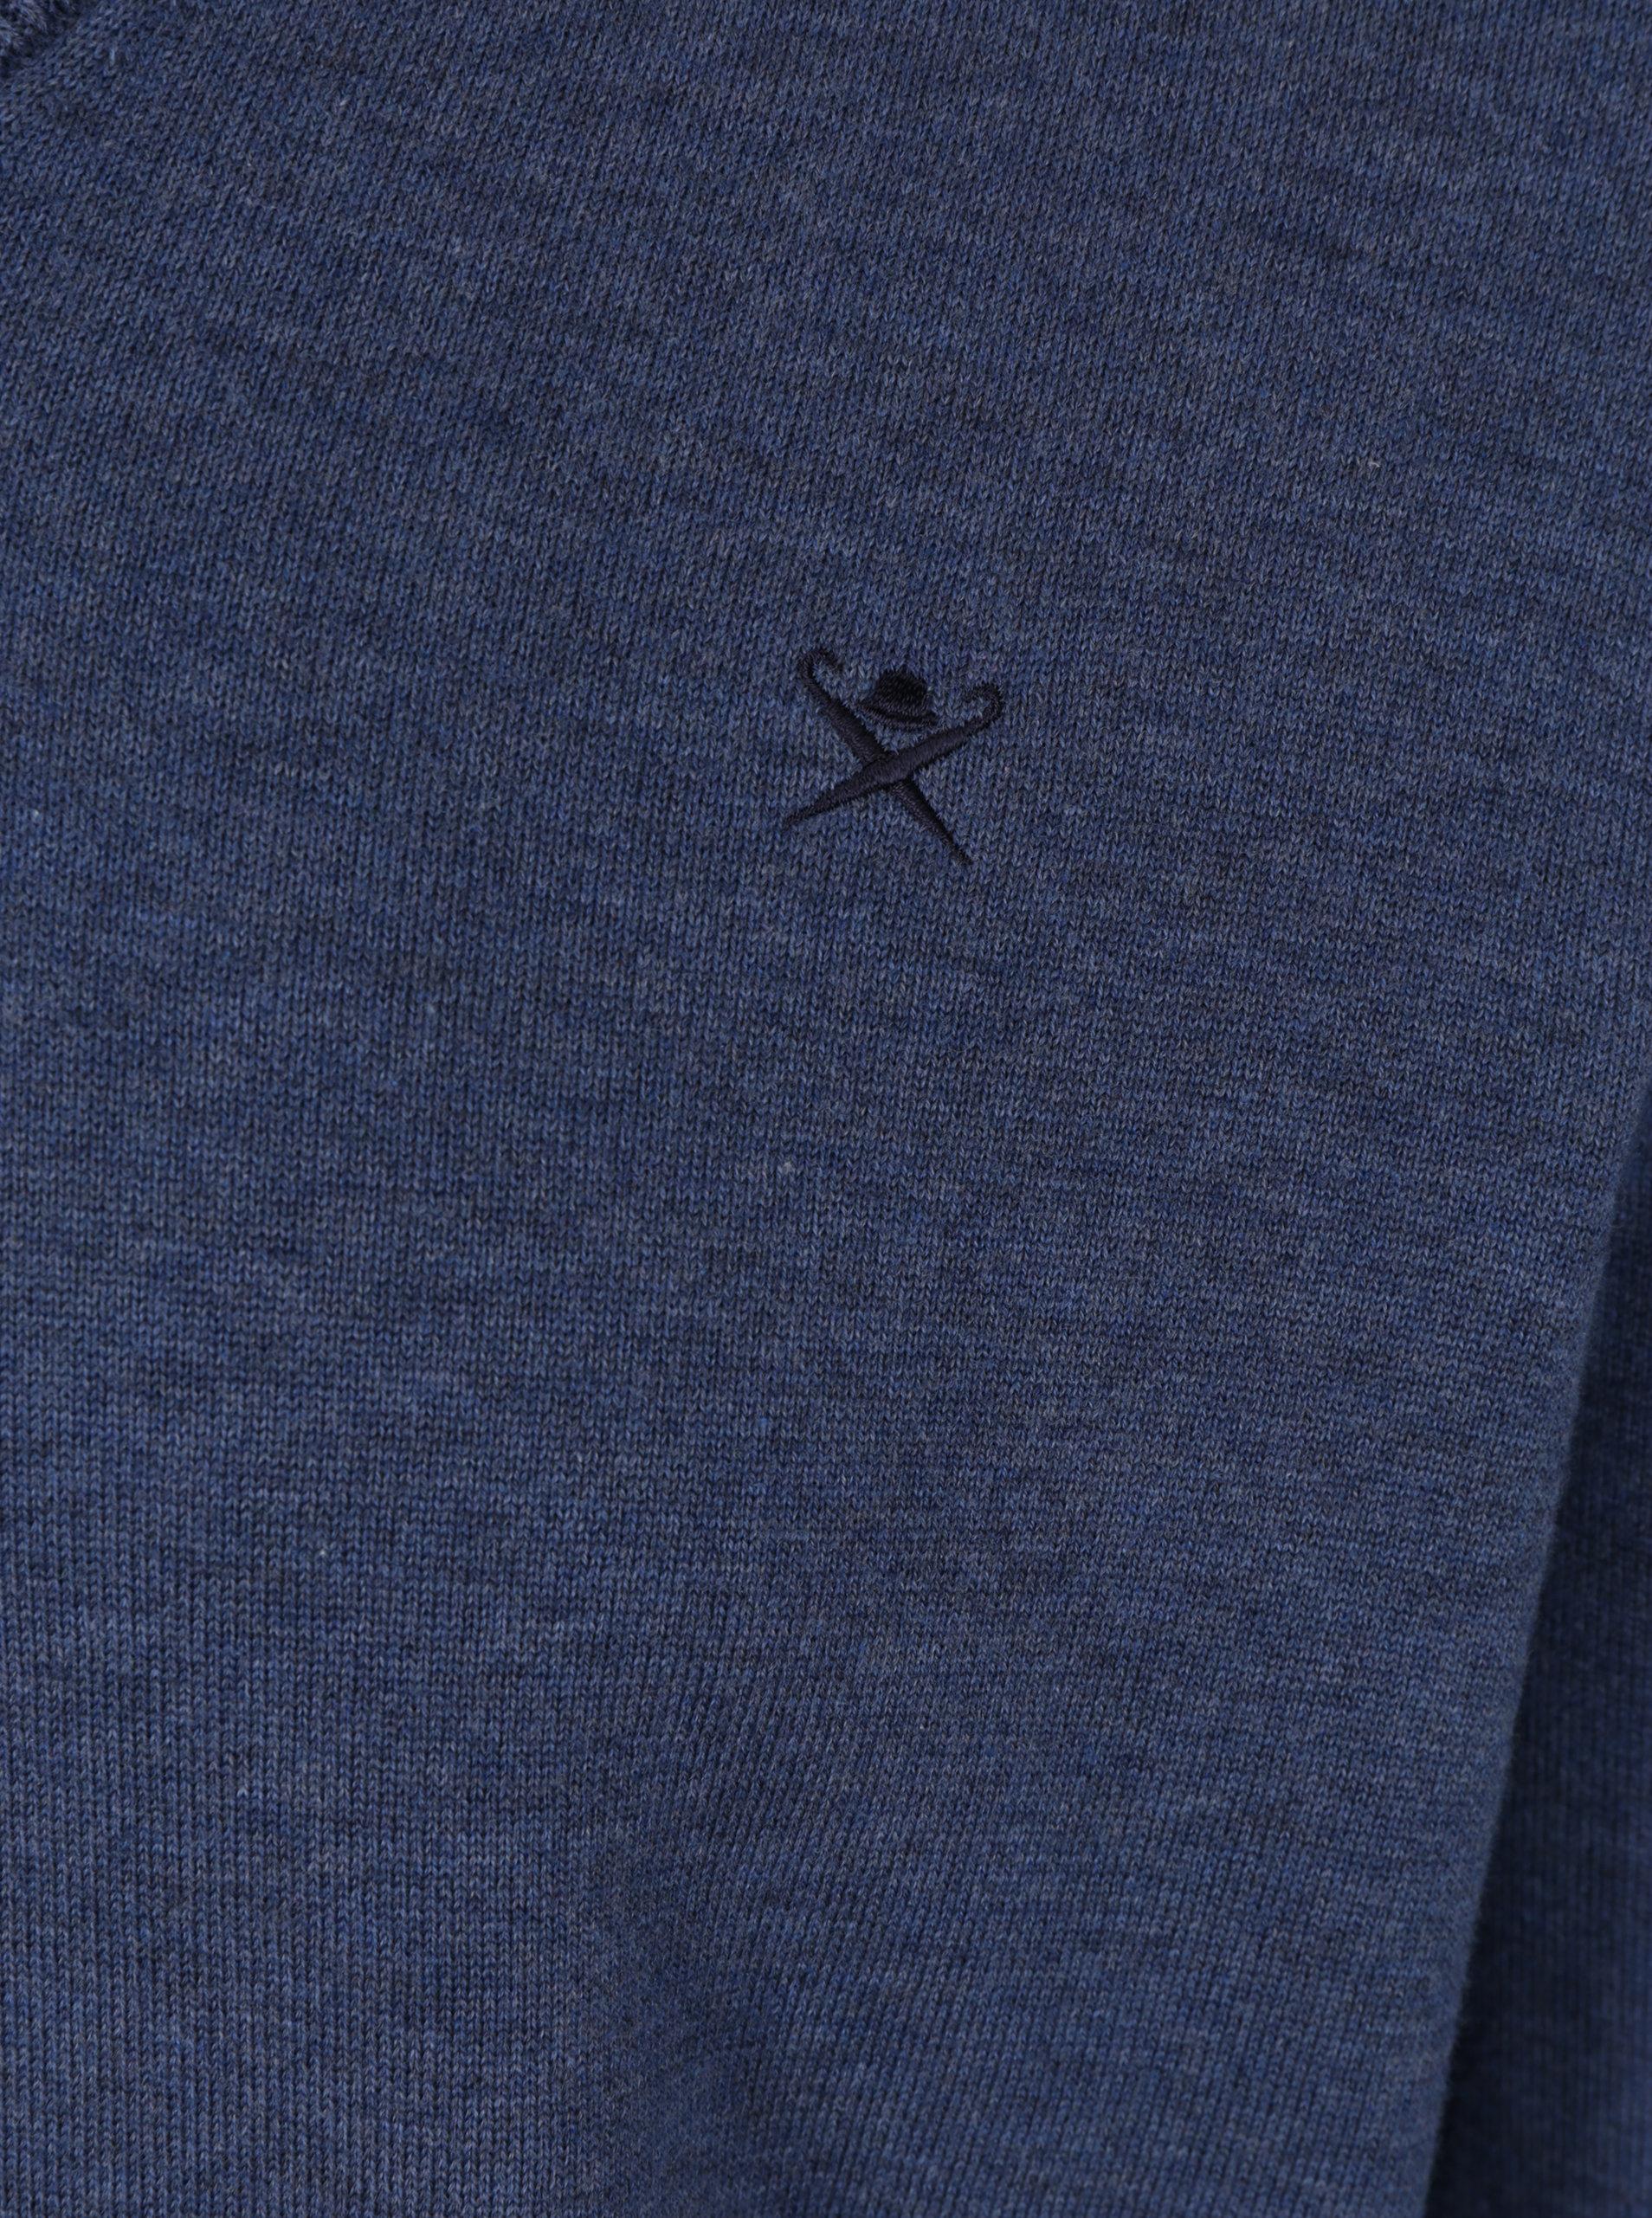 d9a56c29e8da Modrý sveter s véčkovým výstrihom Hackett London ...